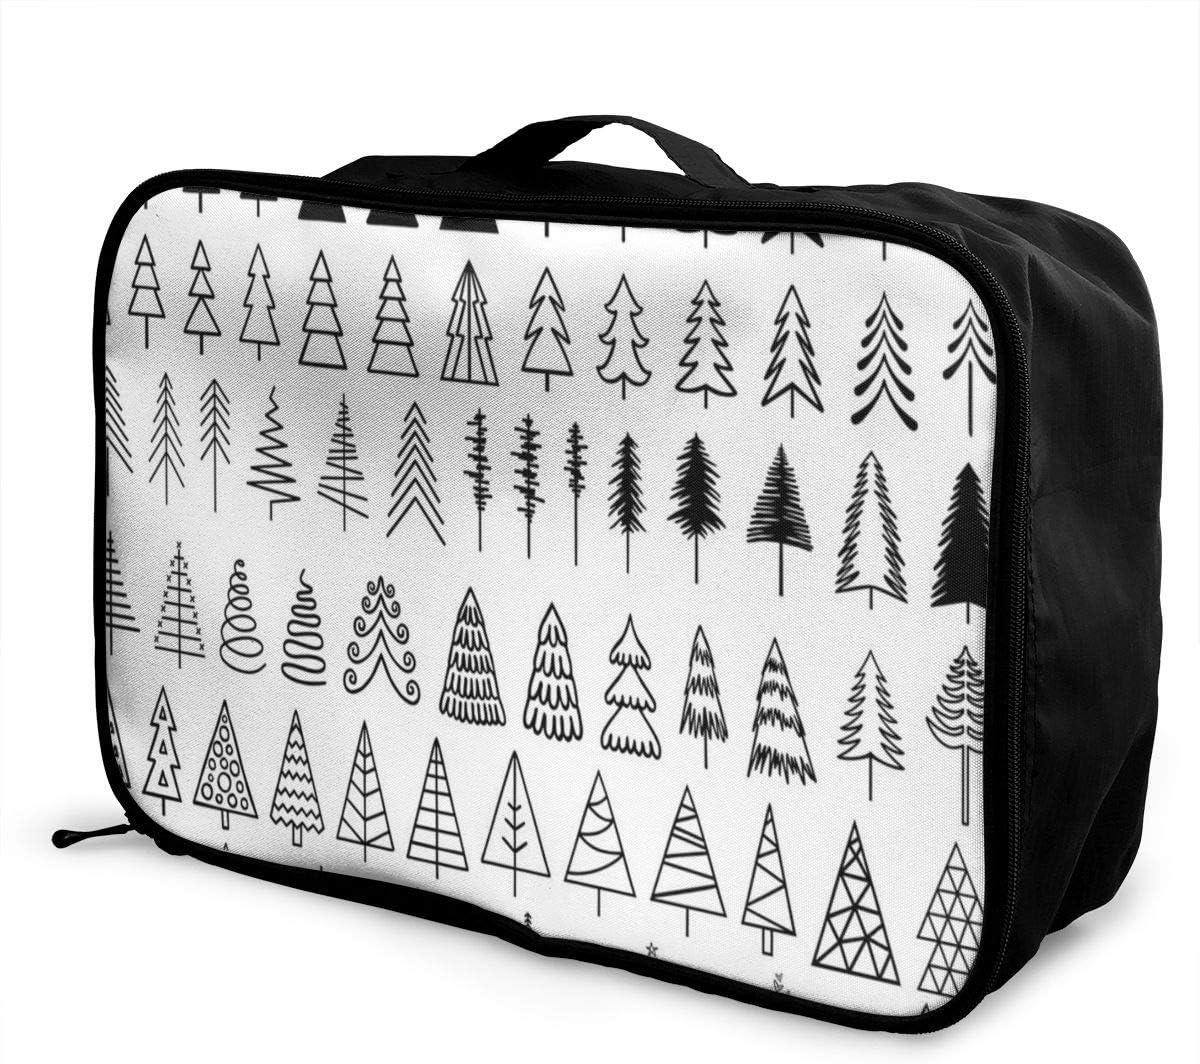 Yunshm Christmas Trees Set Personalized Trolley Handbag Waterproof Unisex Large Capacity For Business Travel Storage